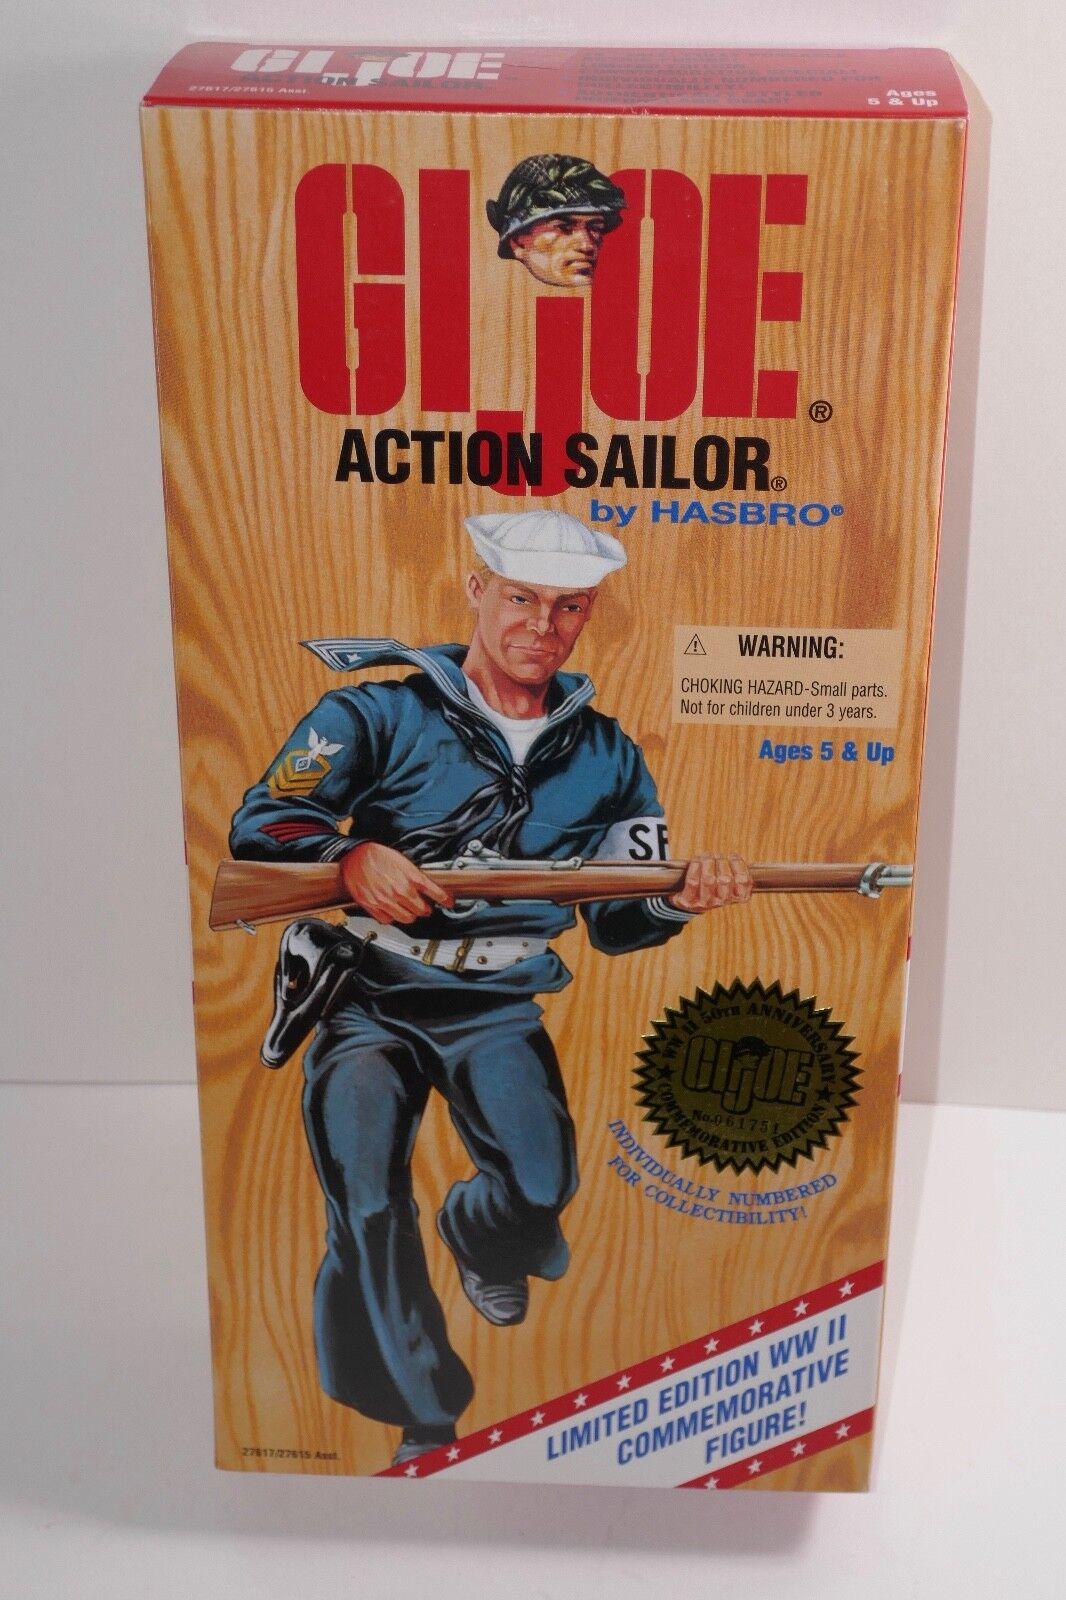 Hasbro 1995 G.I. Joe Action Sailor World War II Limited Edition 12  Figure